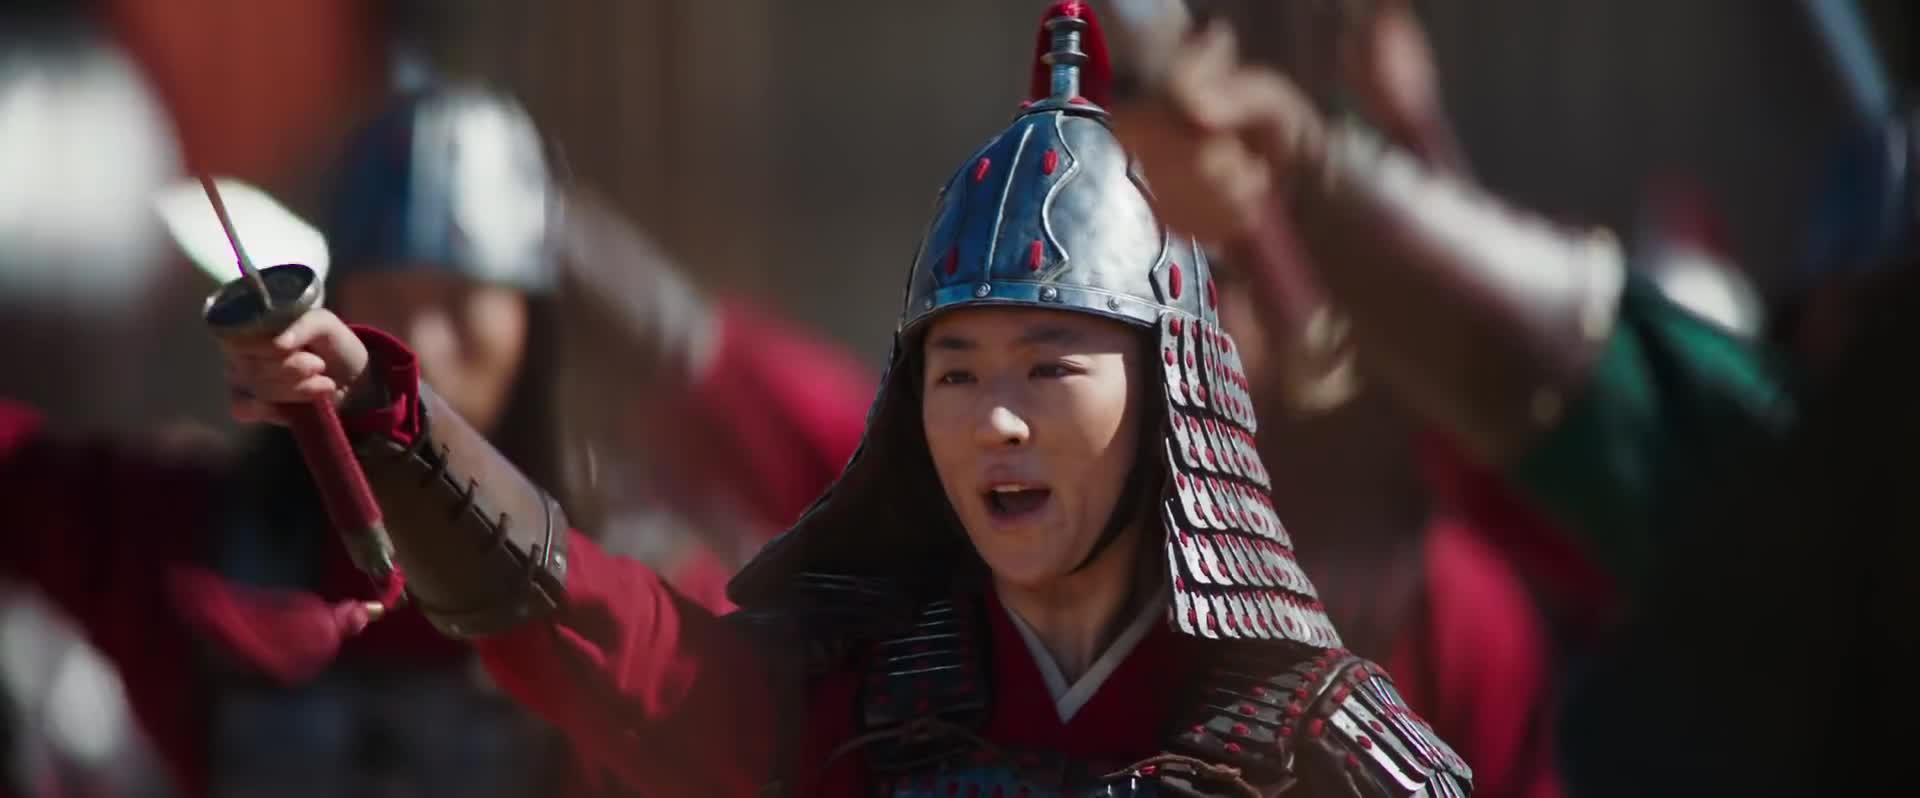 Trailer, Kino, Kinofilm, Super Bowl, Disney, Super Bowl 2020, Mulan